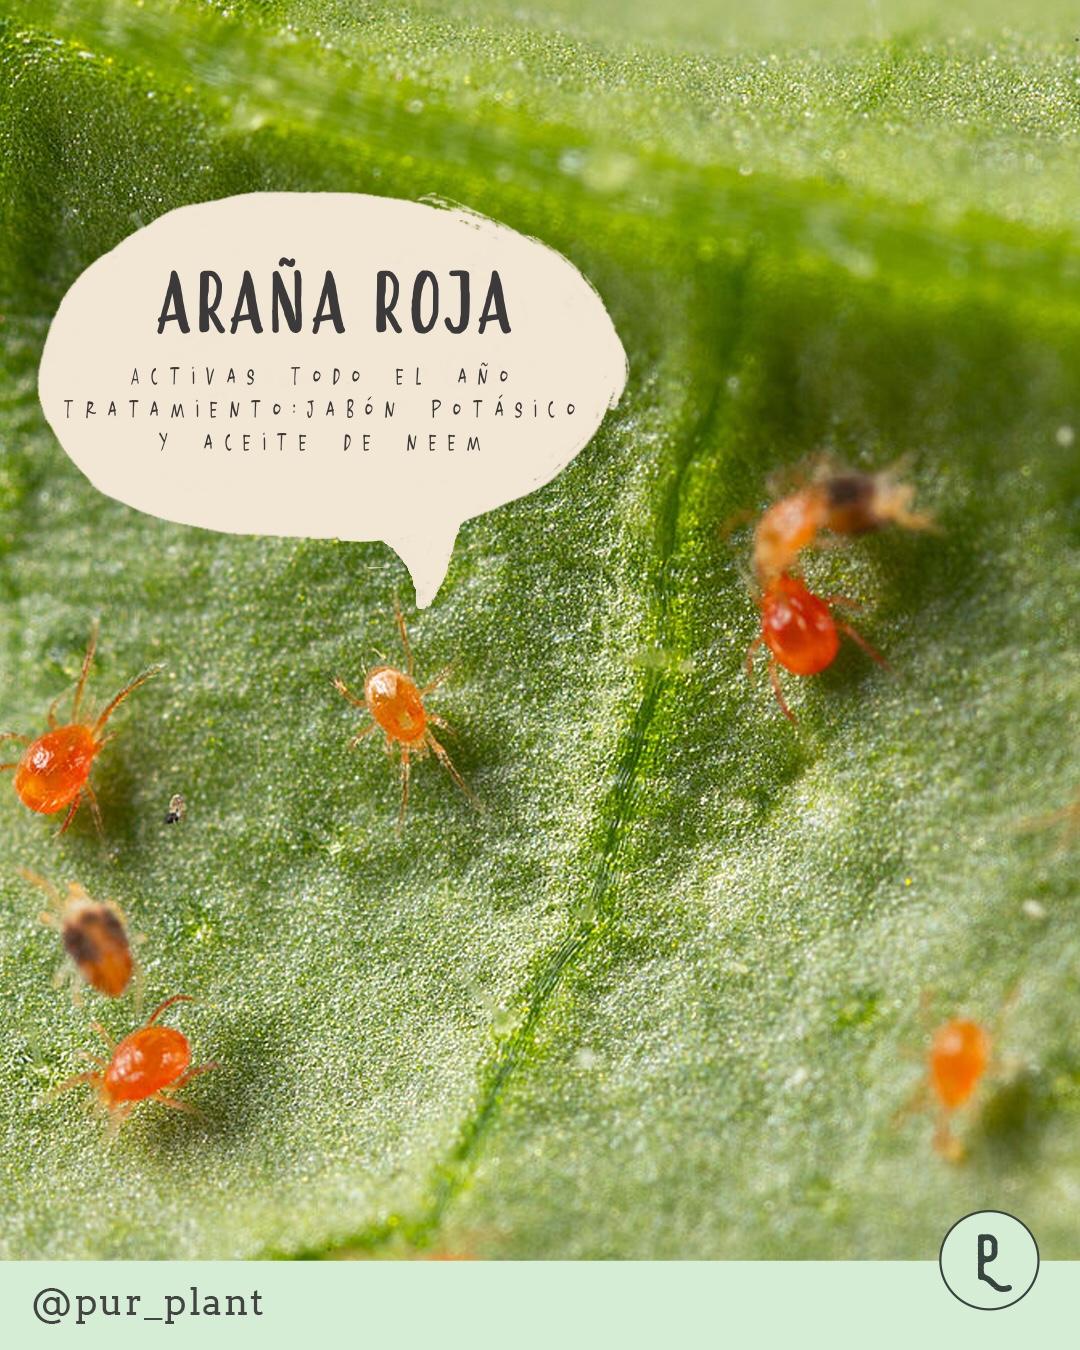 araña roja plaga plantas